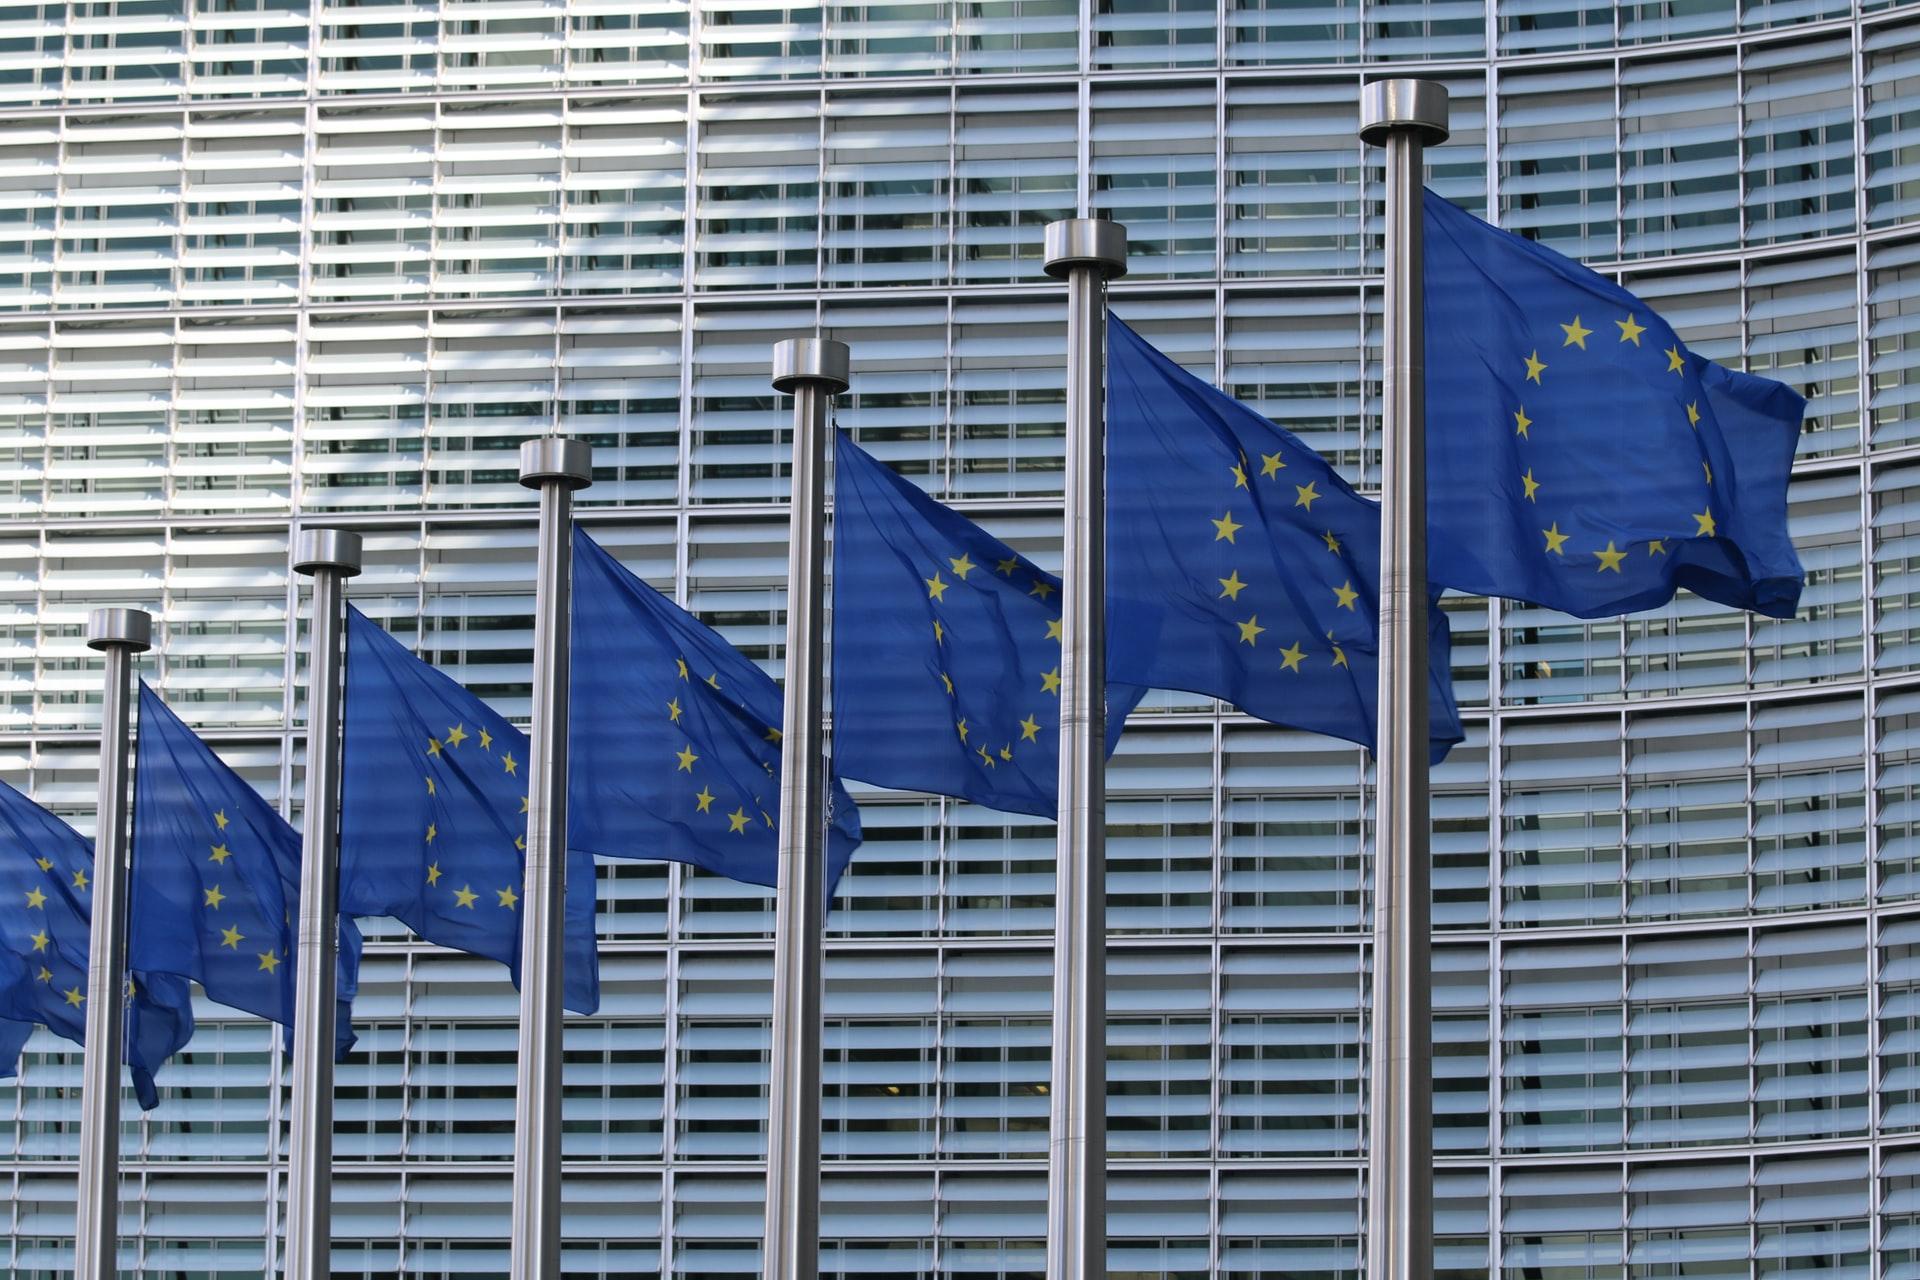 Flags outside EU Commission building